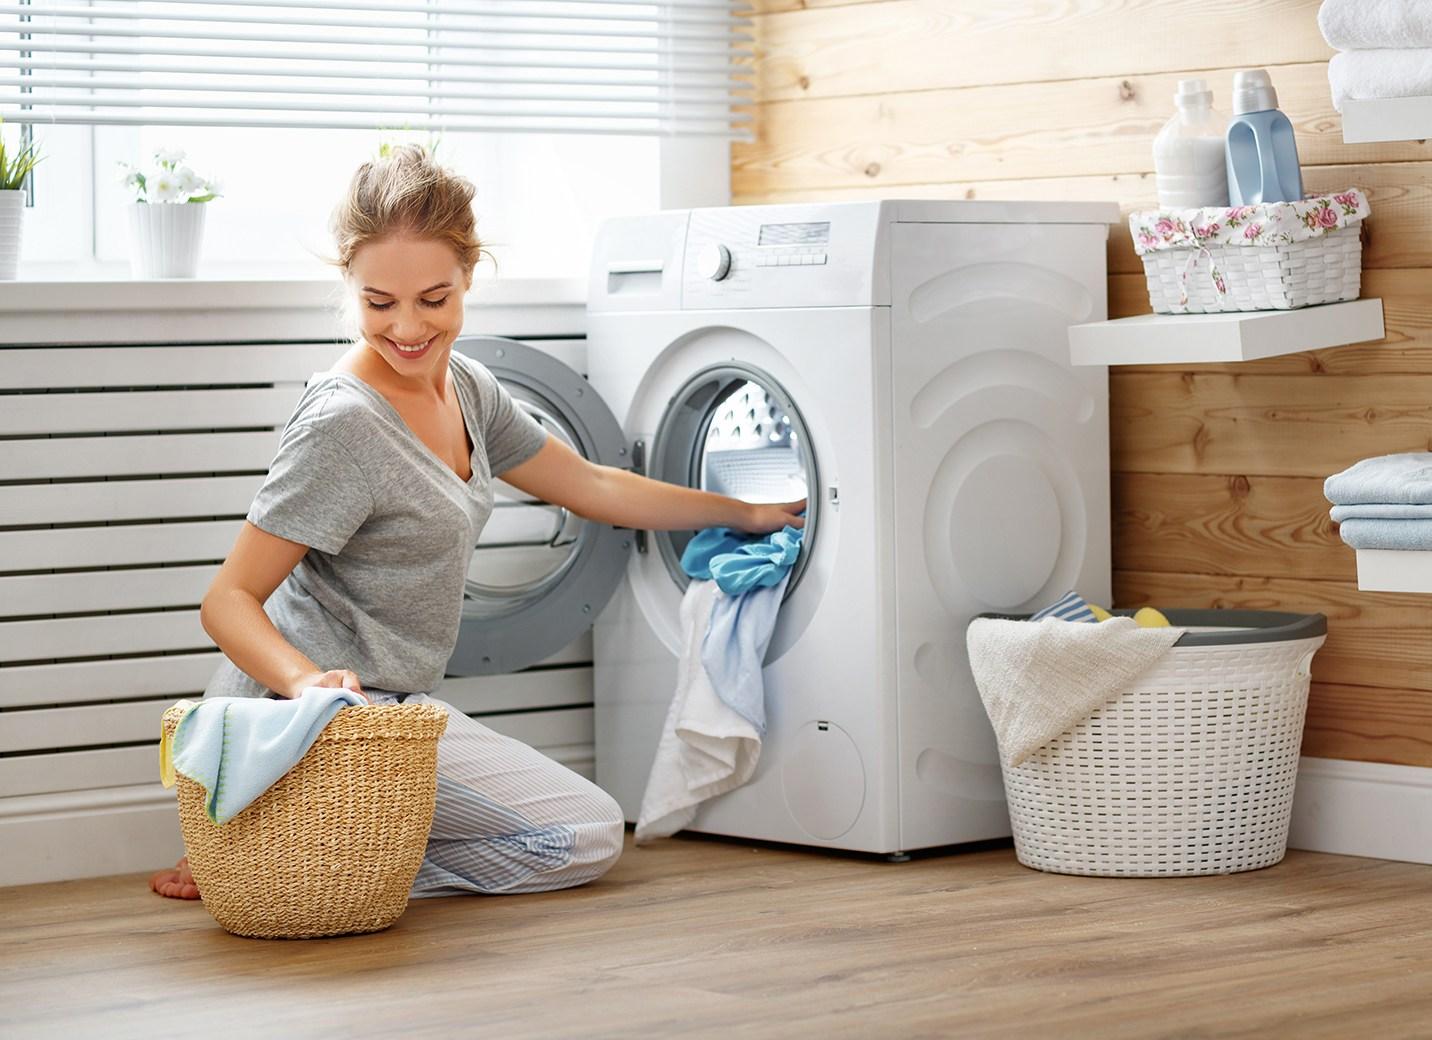 dye-free laundry detergents1